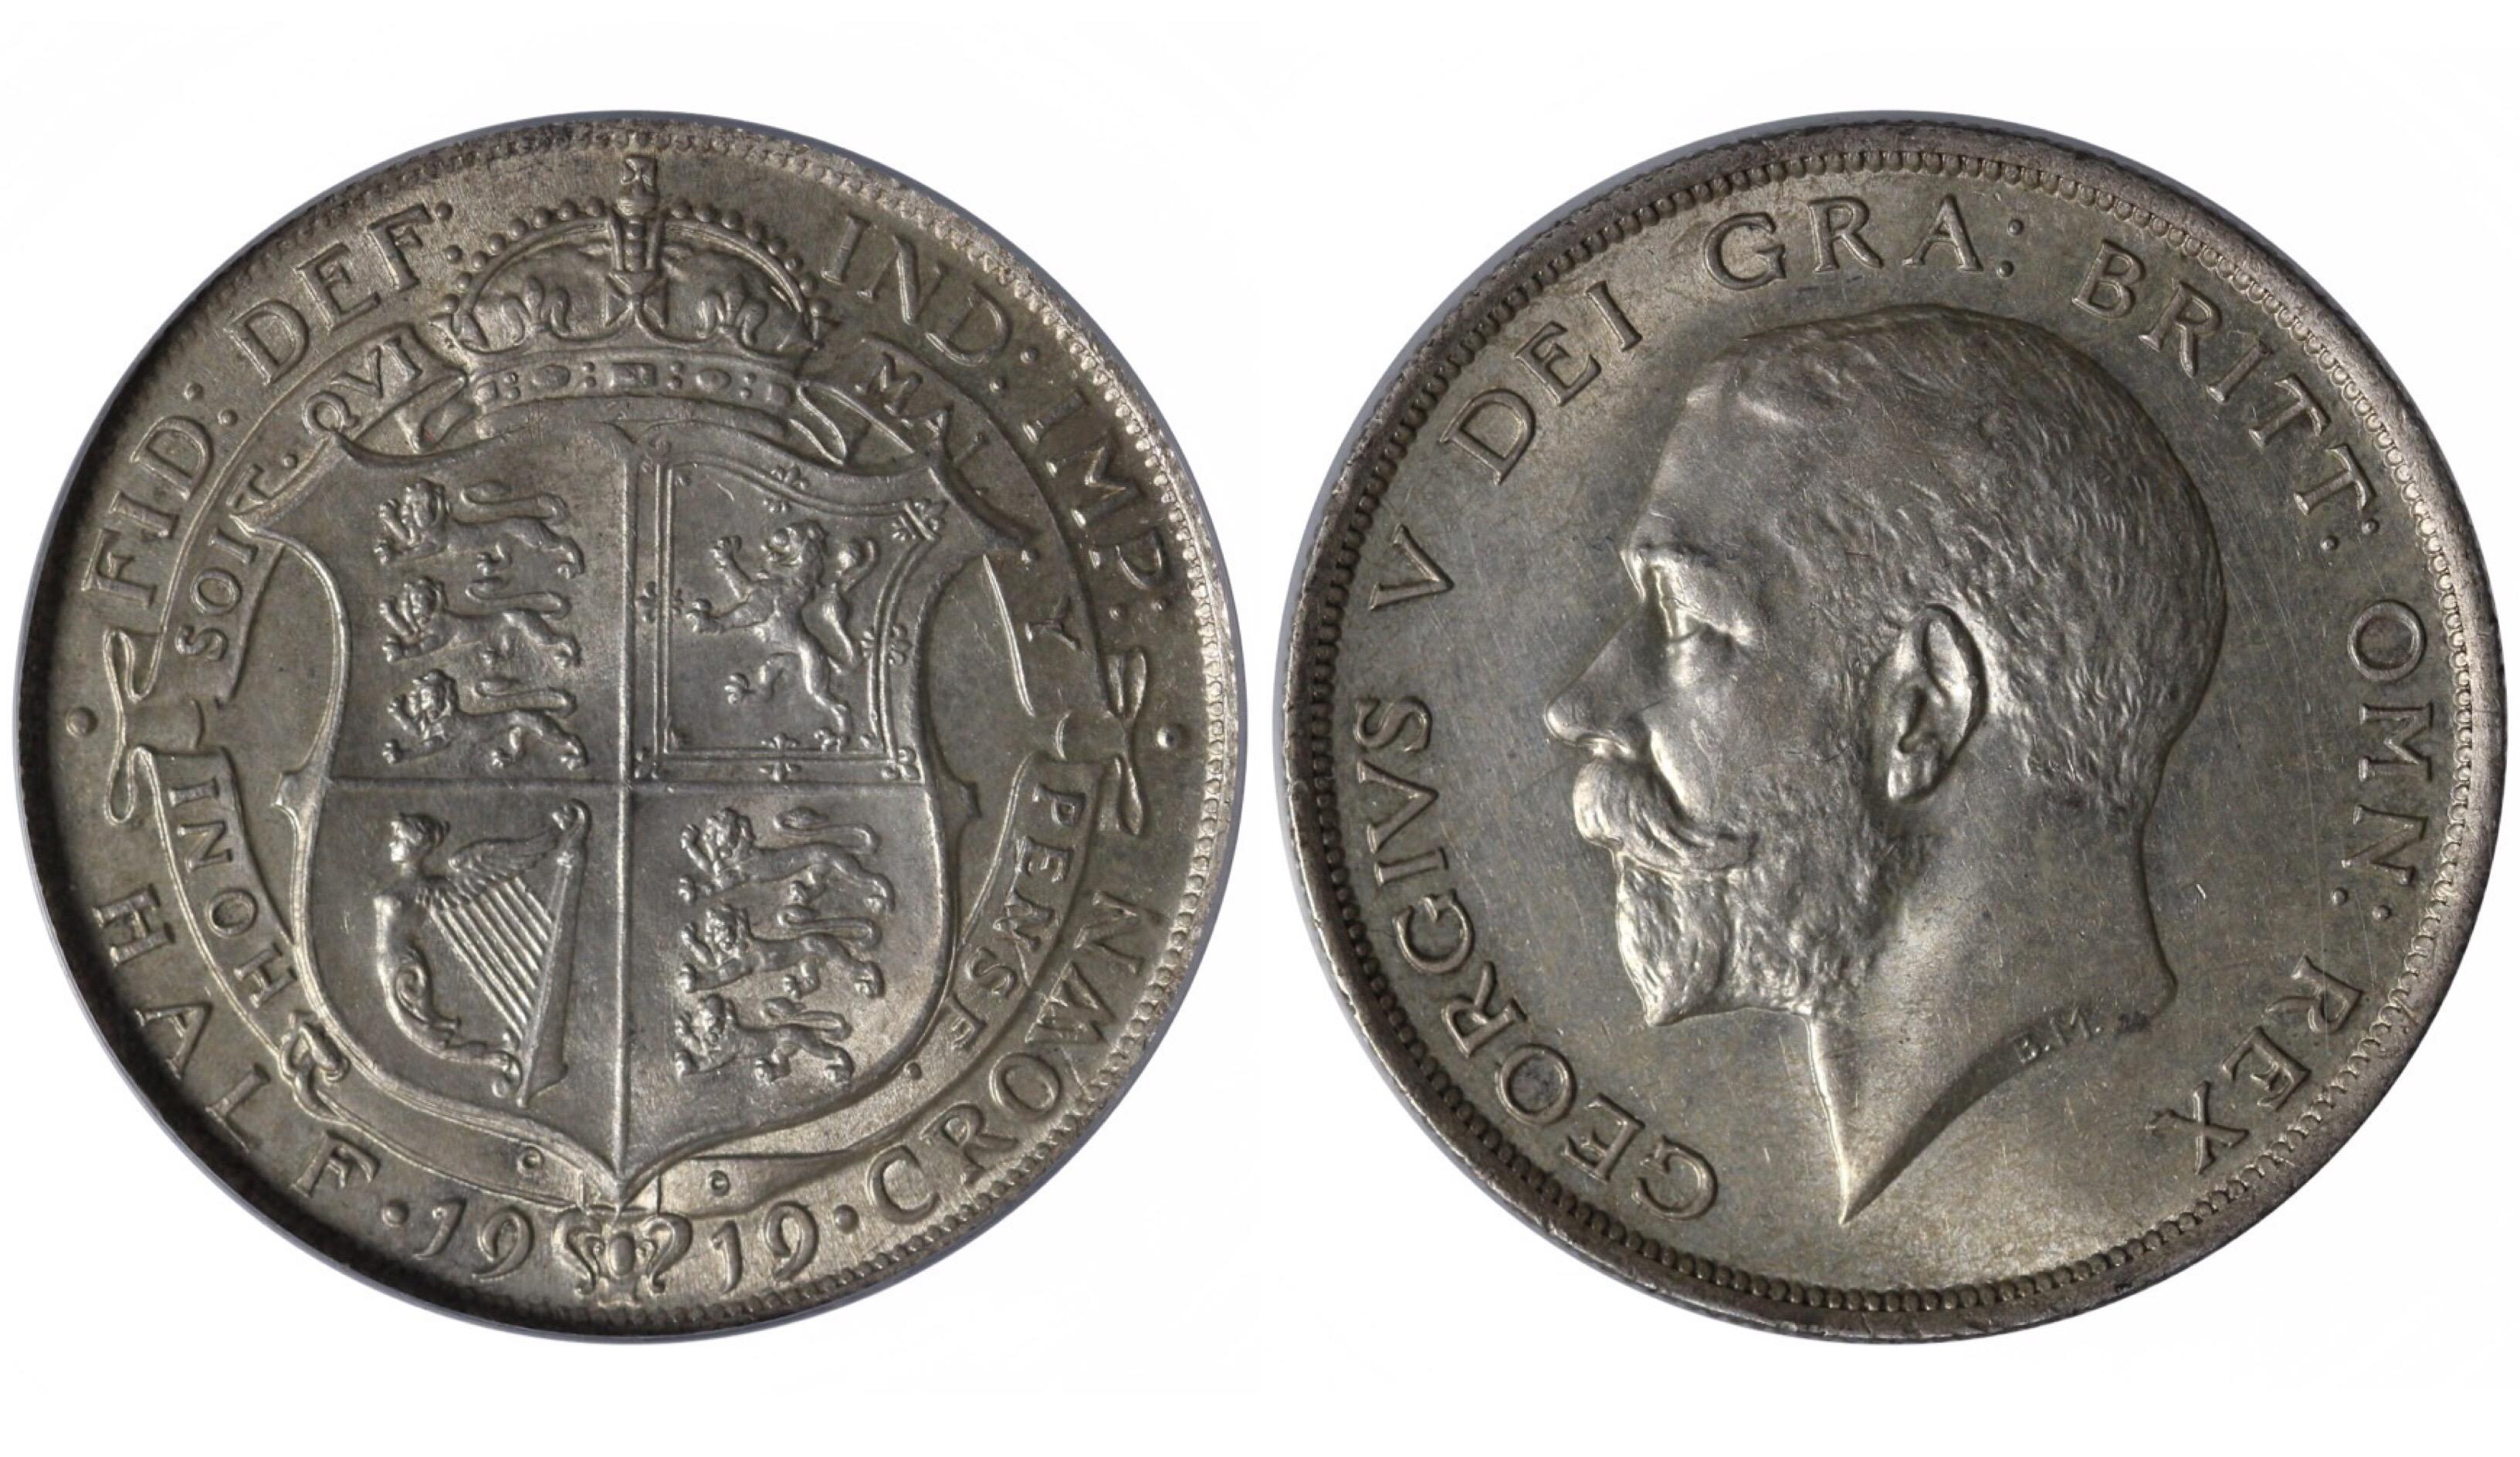 1919 Halfcrown, CGS 78, Davies 1670, UIN 30918